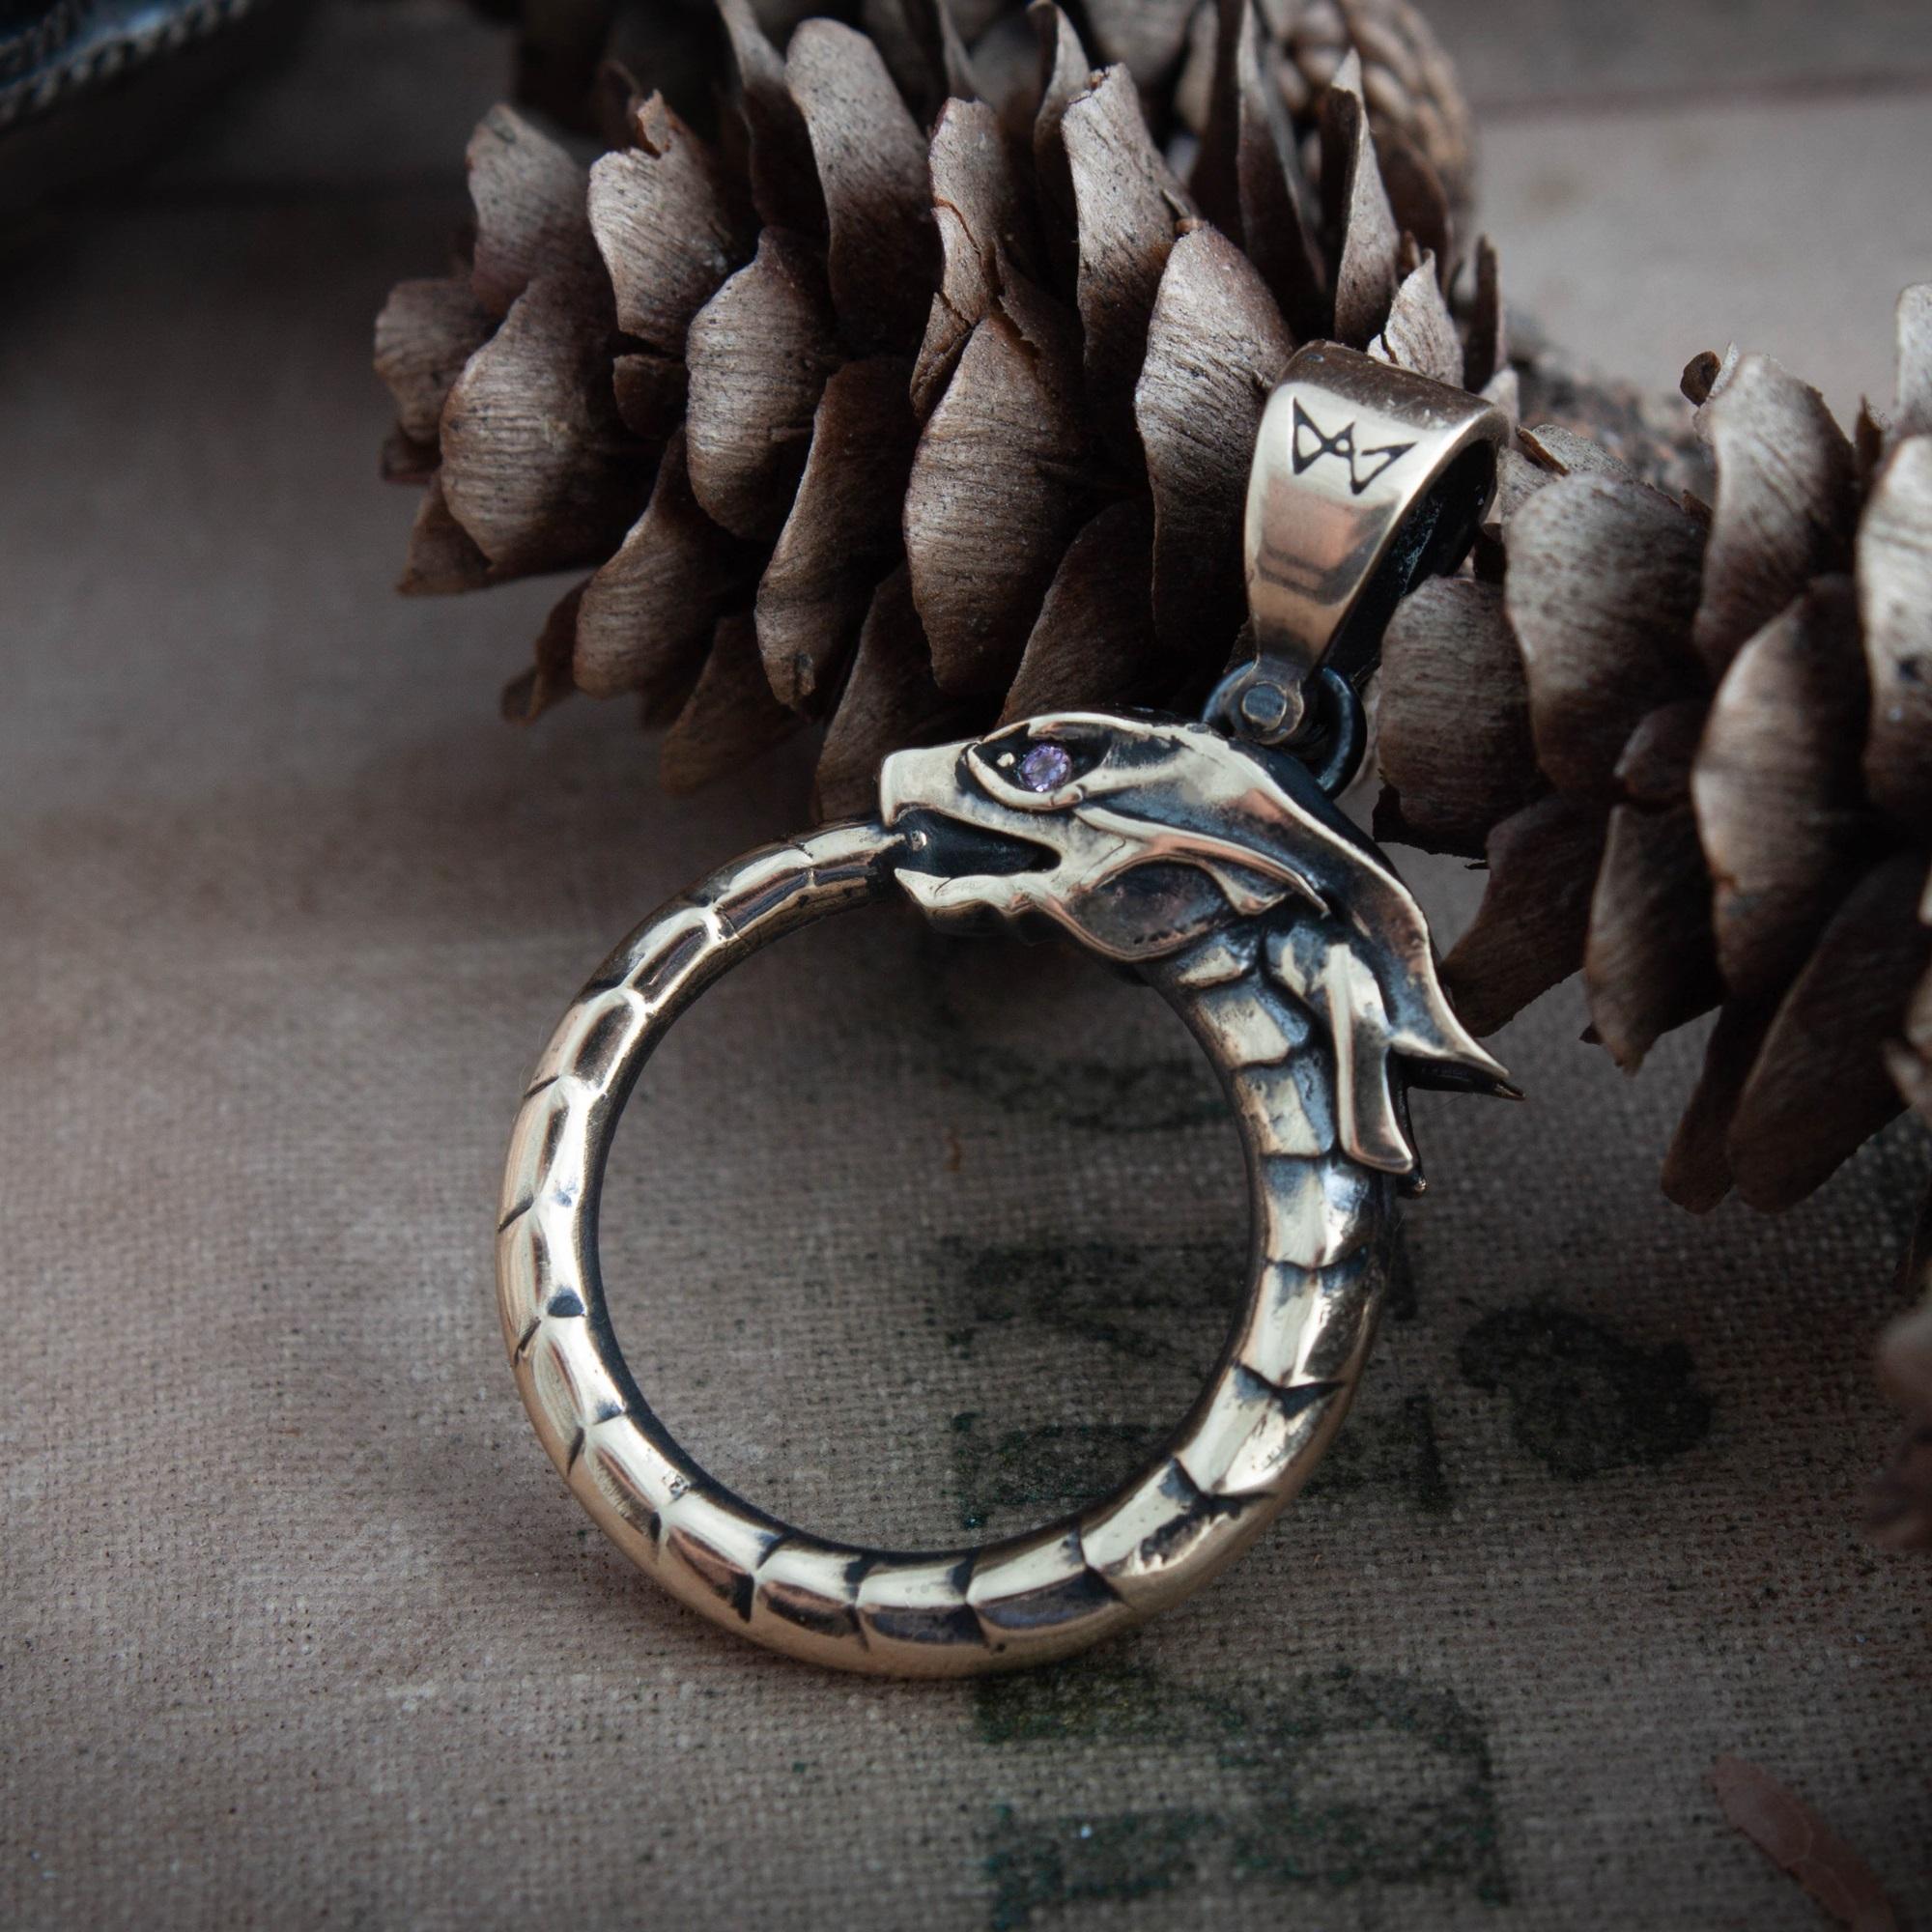 Merchandise Ouroboros Pendant Serpent Mythology Necklace